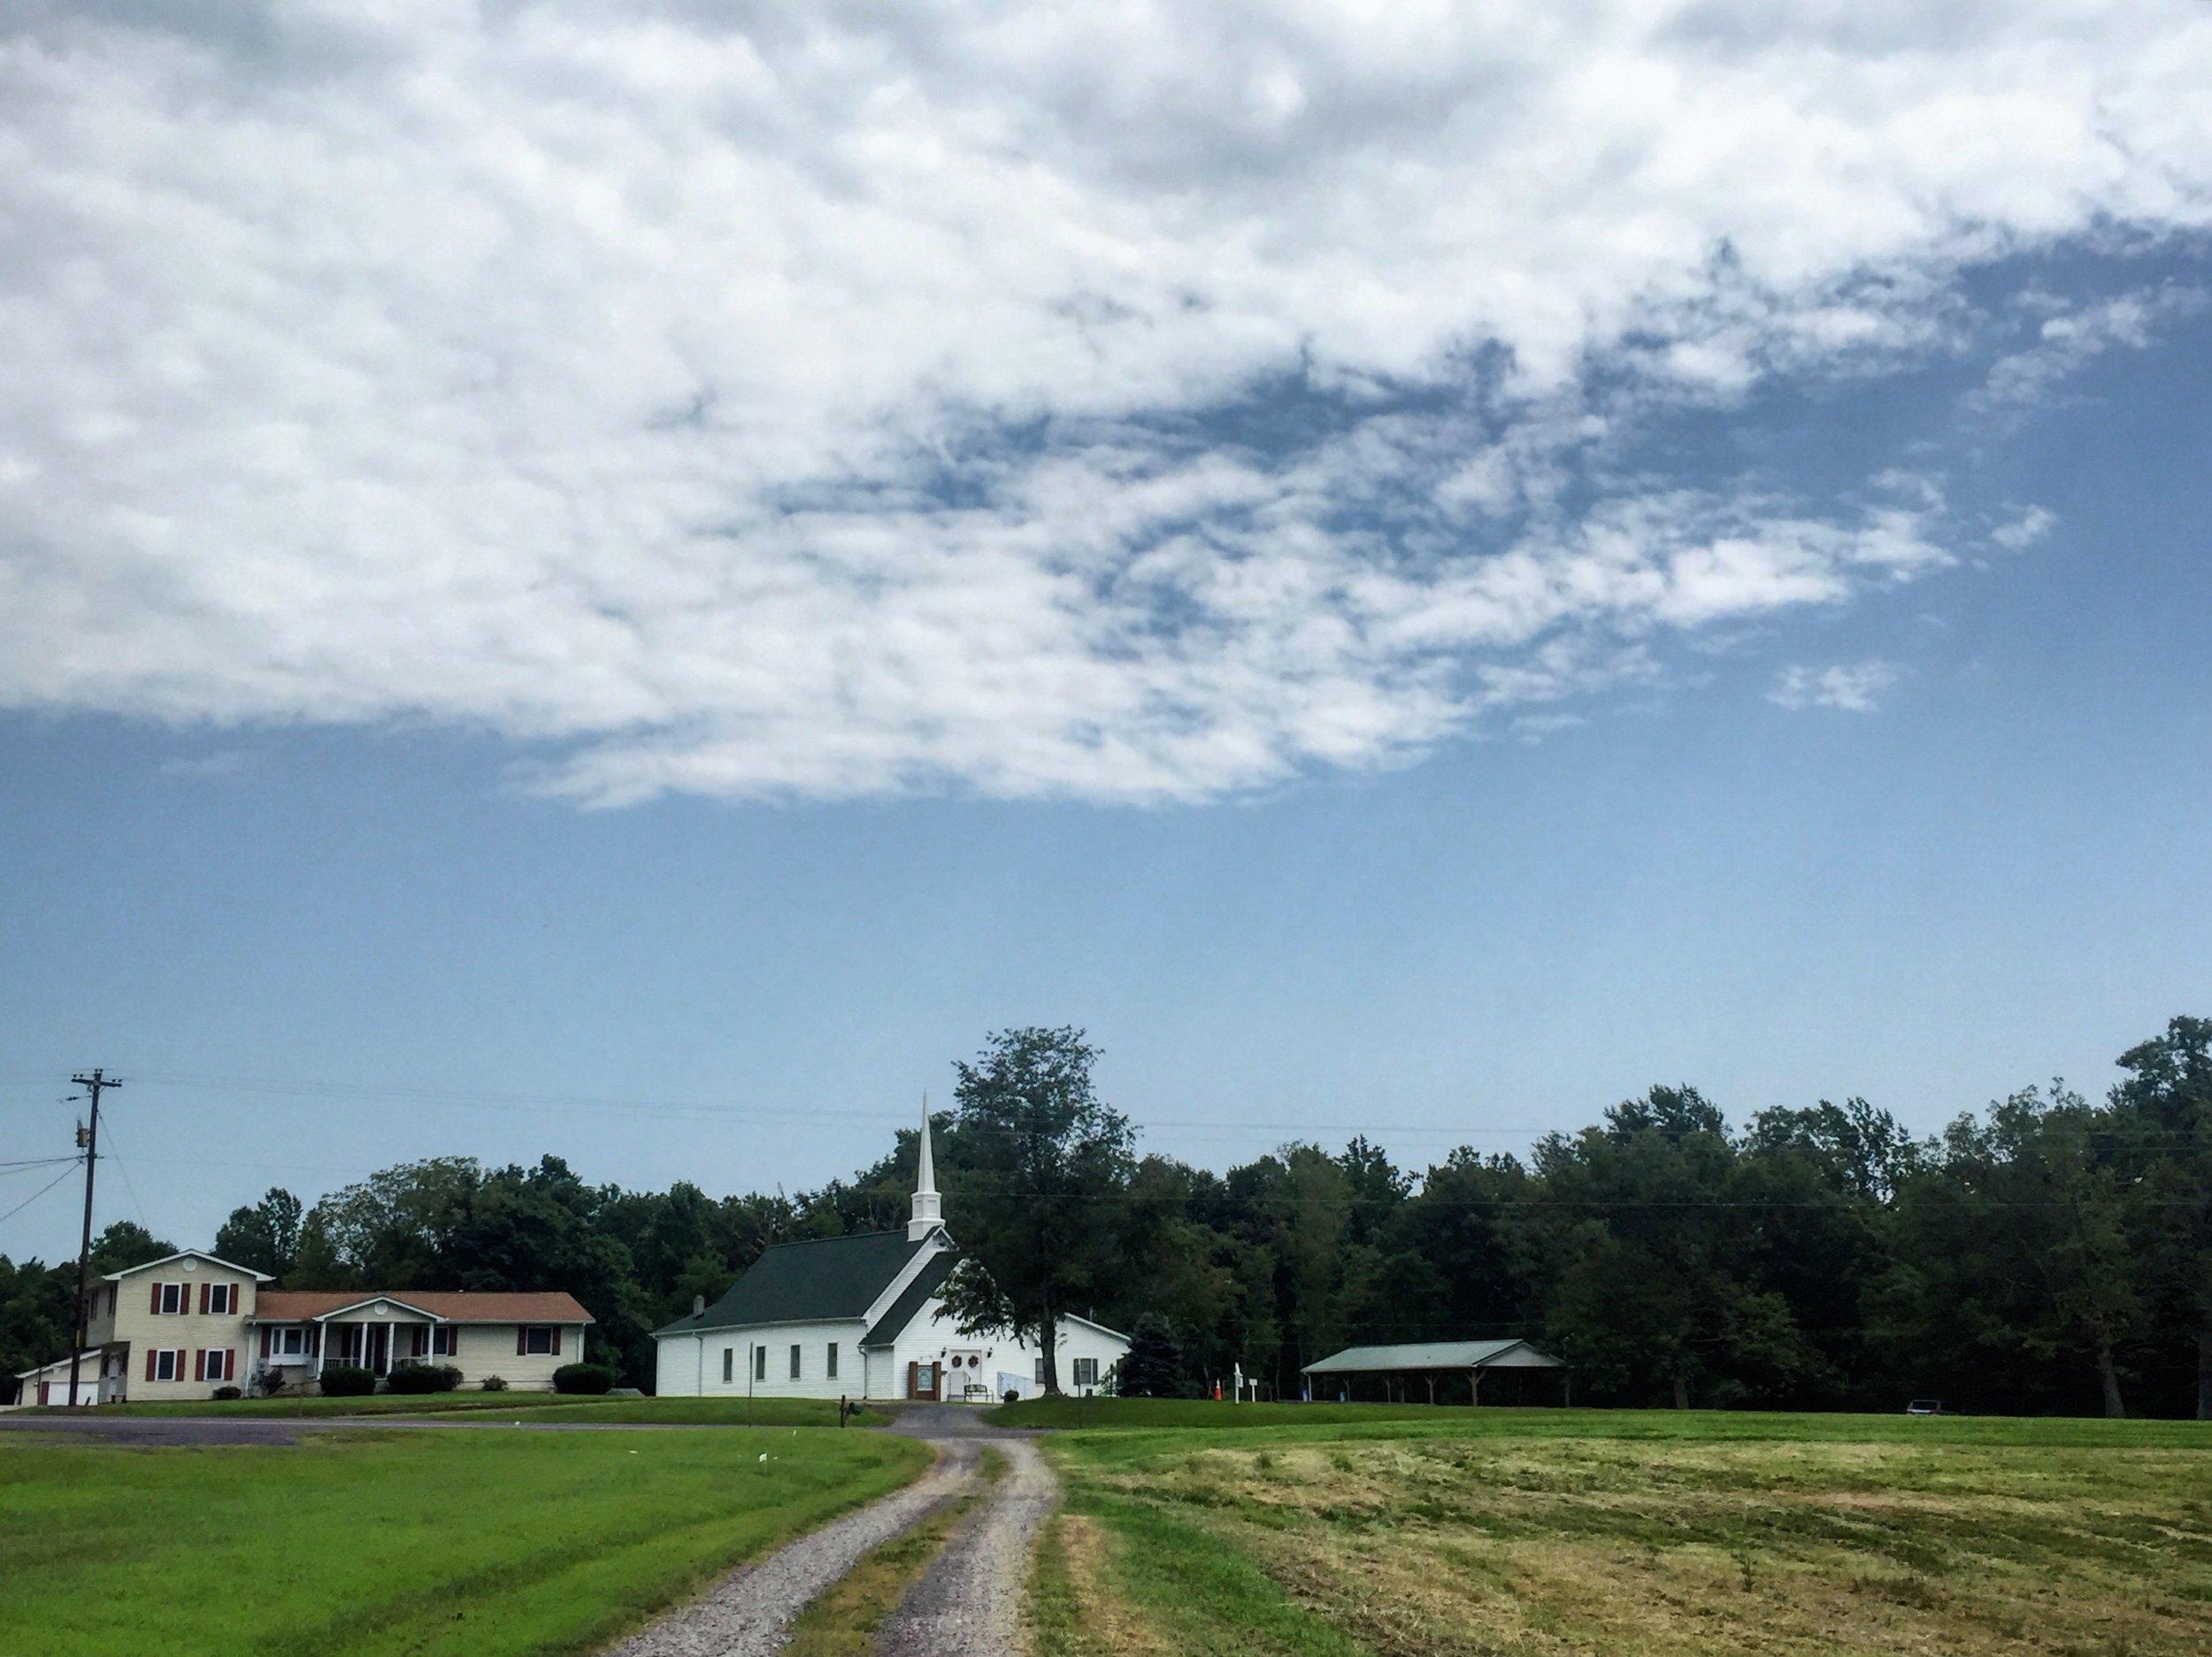 Good Hope Baptist Church, Culpeper Virginia, August 26, 2018. (Photo by author)